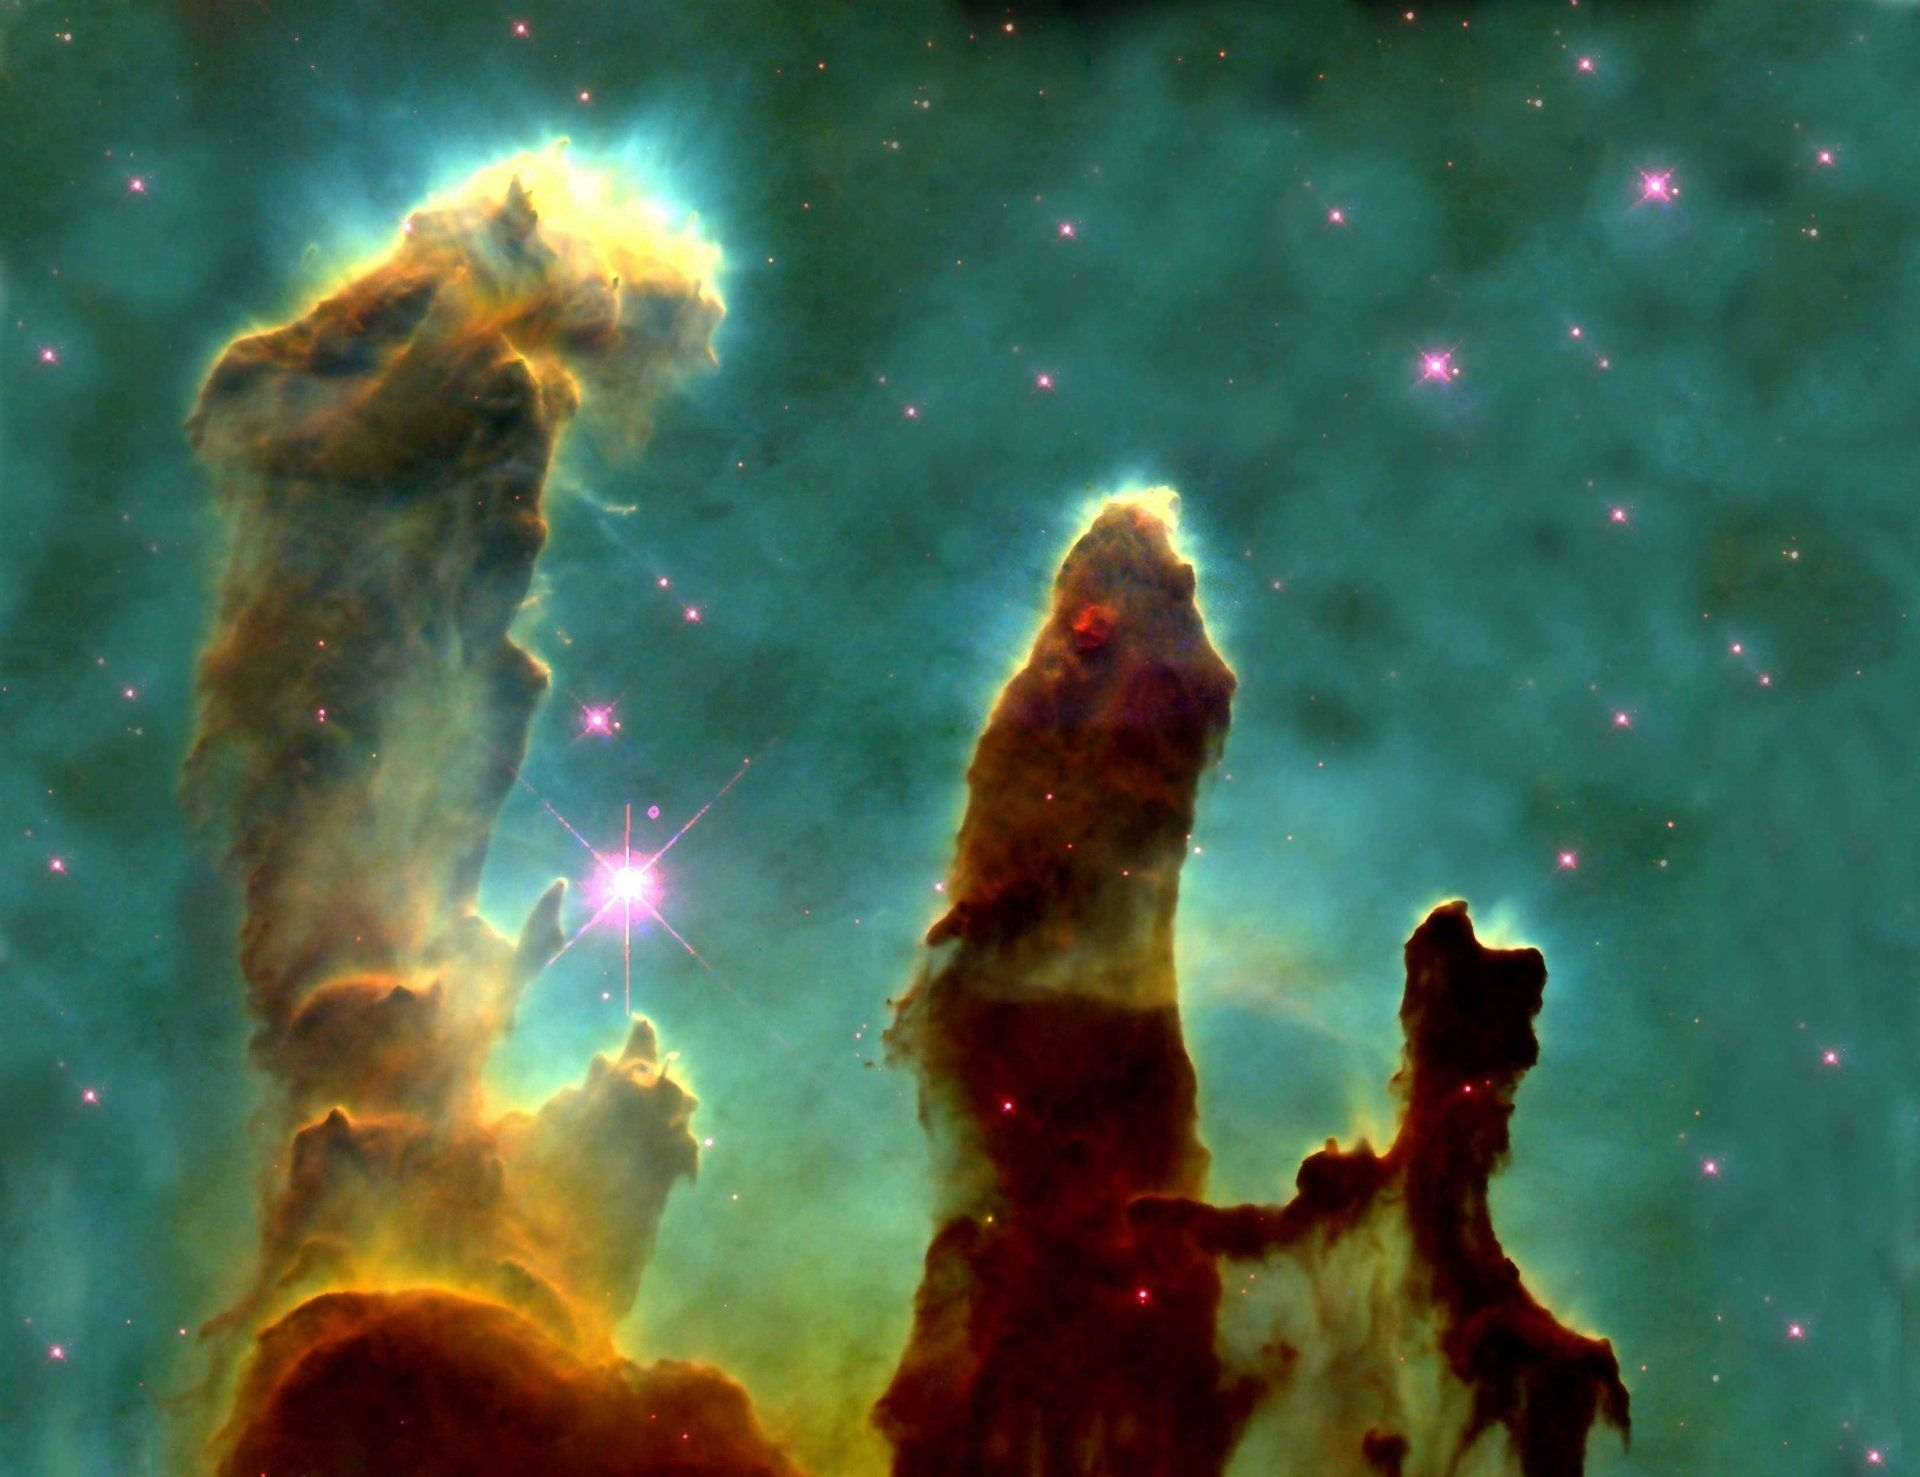 eagle nebula pillars of creation gas cloud hd wallpaper | wallpapers